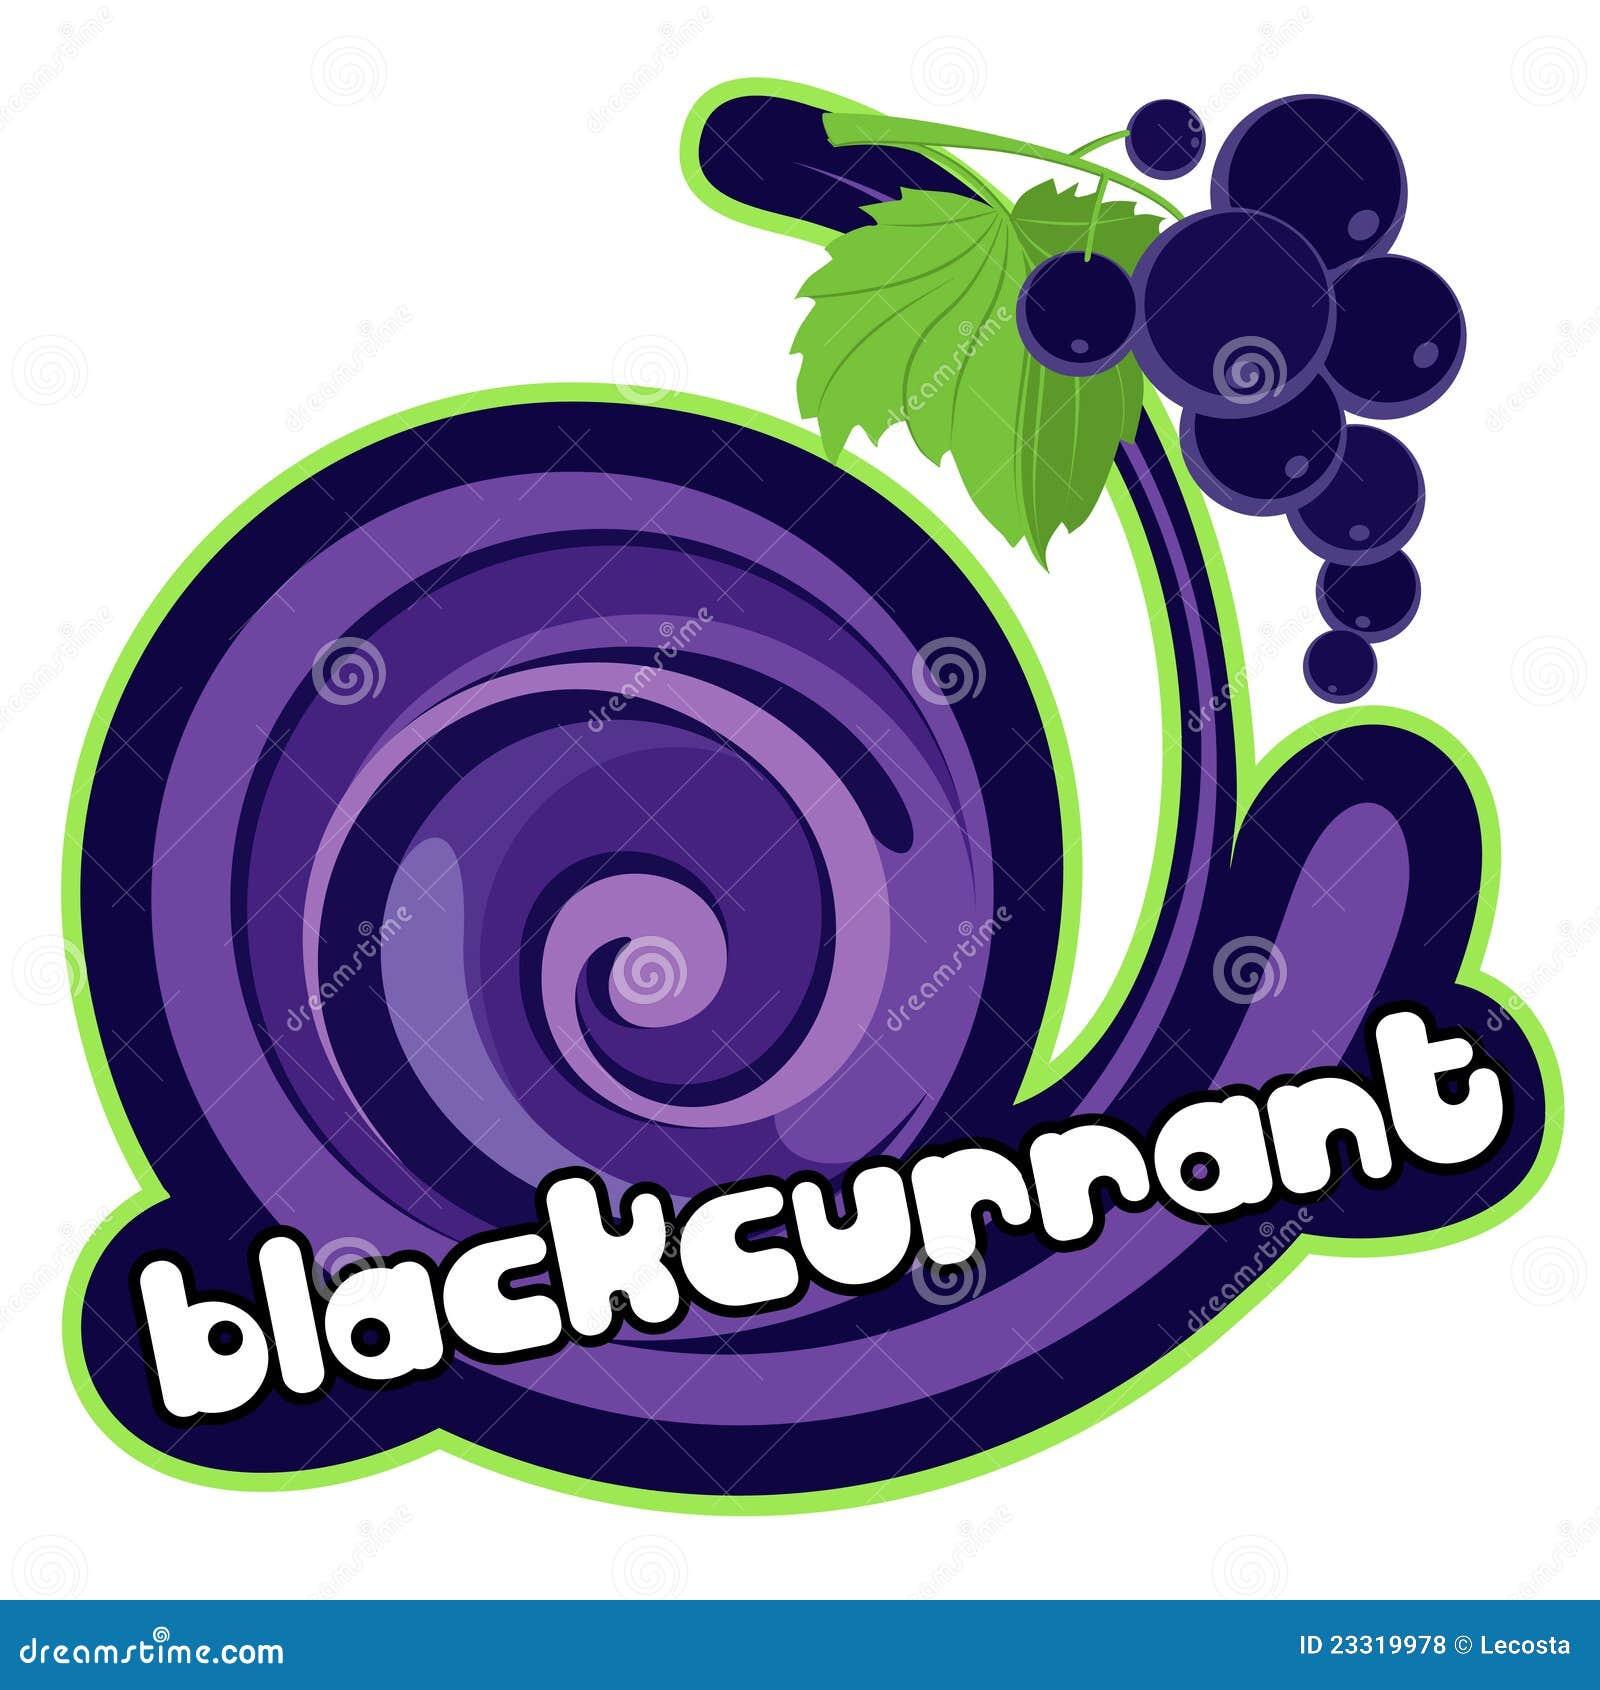 Ice Cream Blackcurrant Royalty Free Stock Photos Image